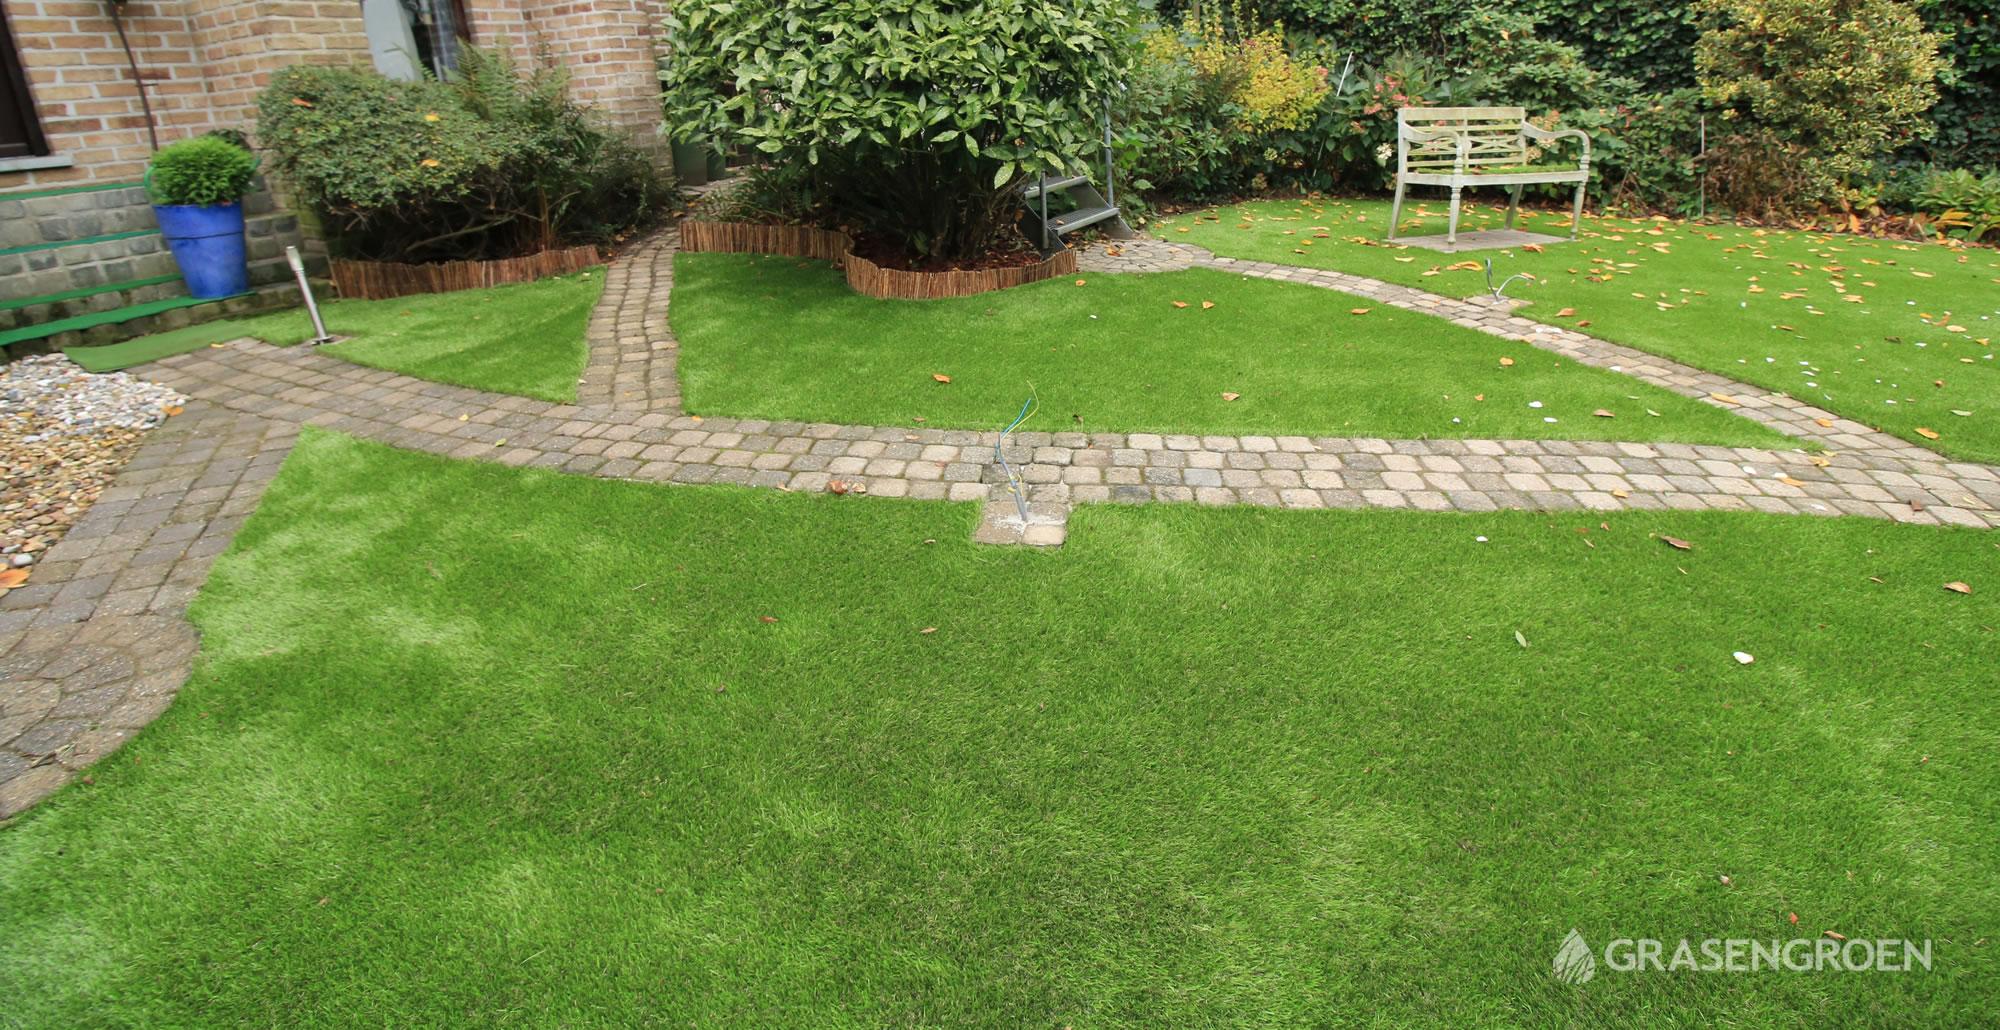 Kunstgrasleggensintjoriswinge13 • Gras en Groen Kunstgras